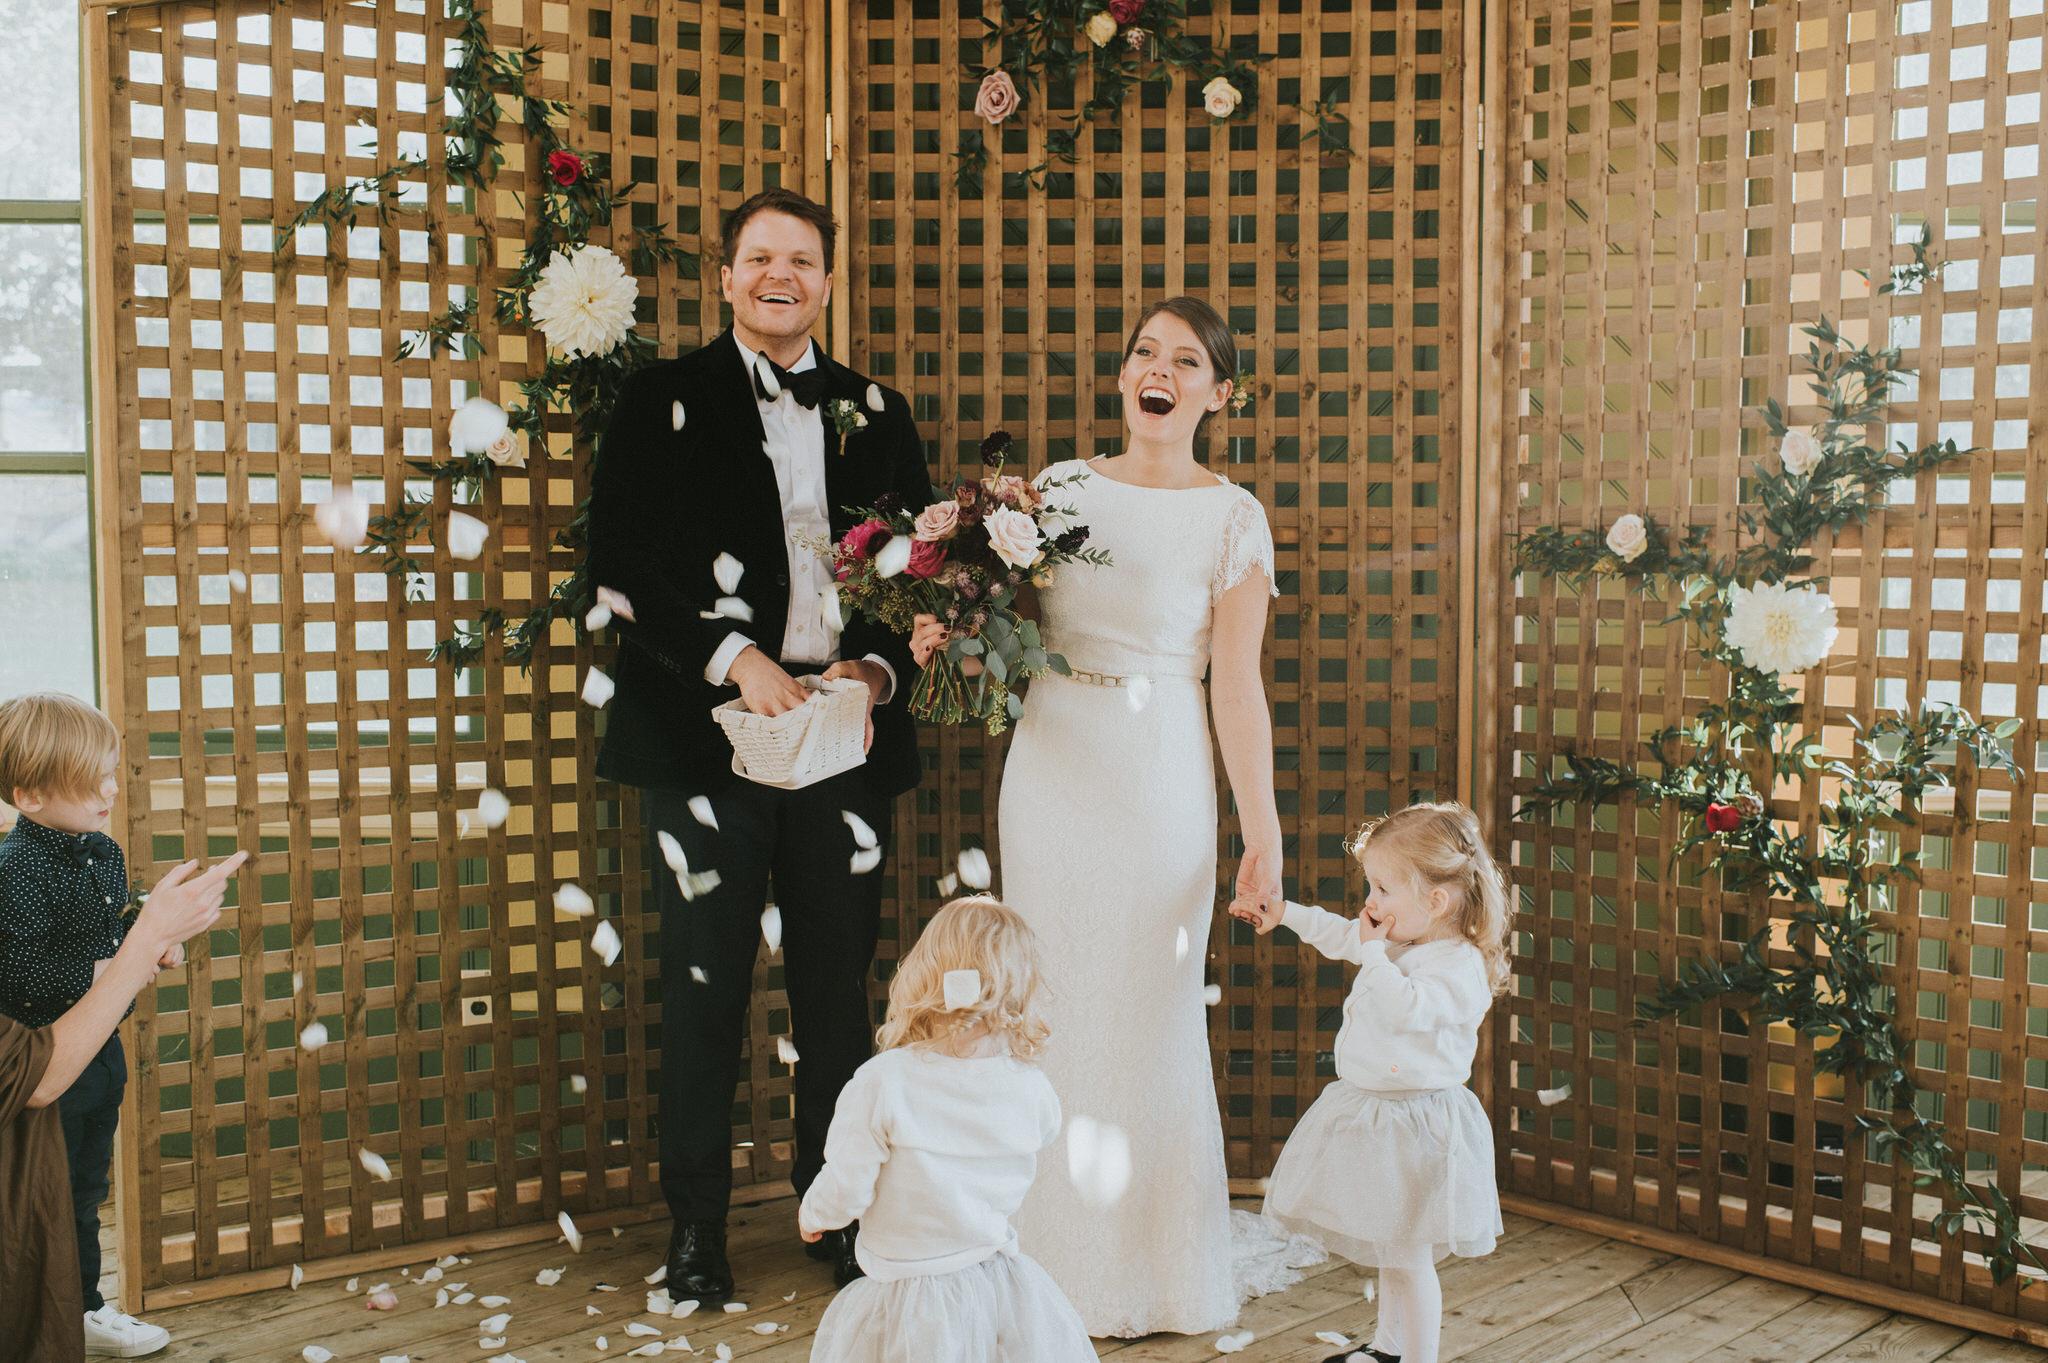 scarletoneillphotography_weddingphotography_prince edward county weddings131.JPG